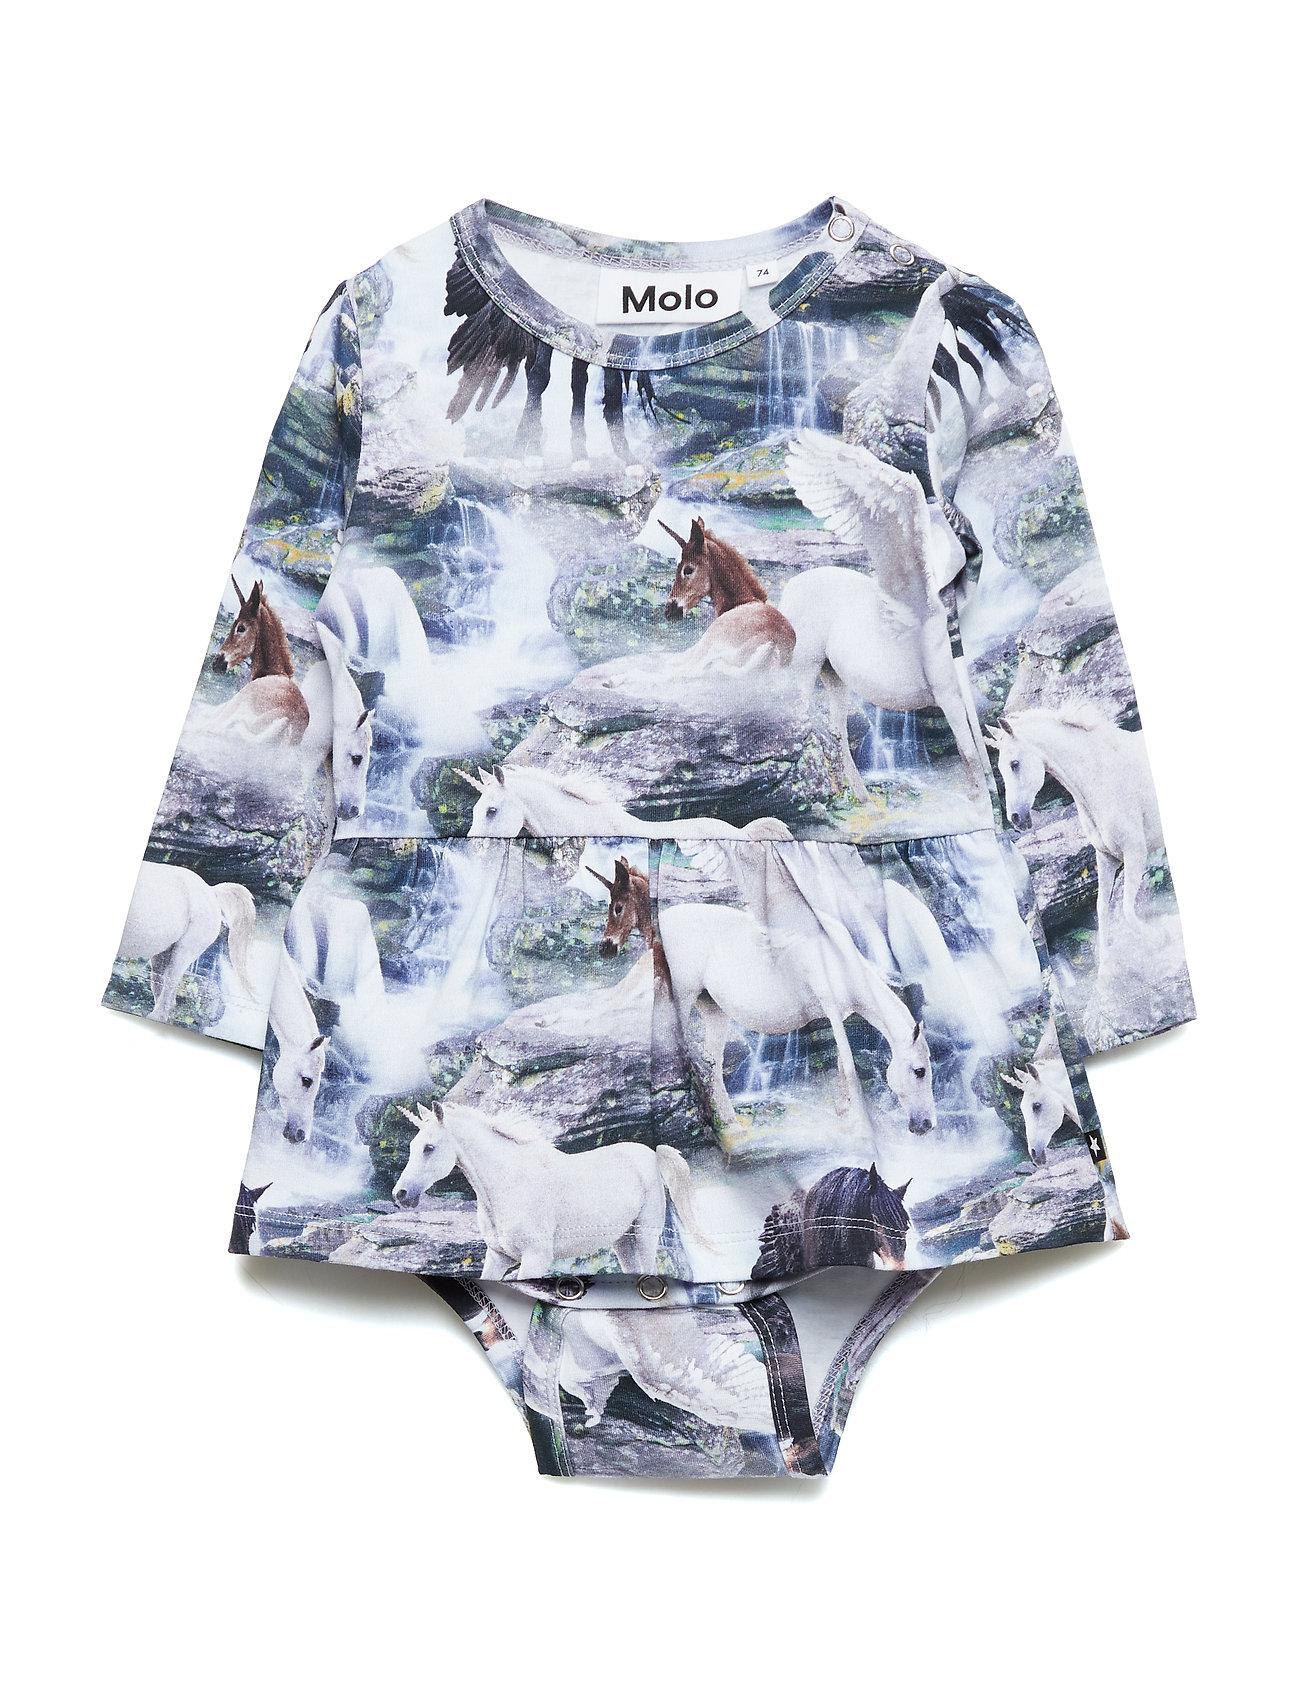 Molo Frances - MYTHICAL CREATURES